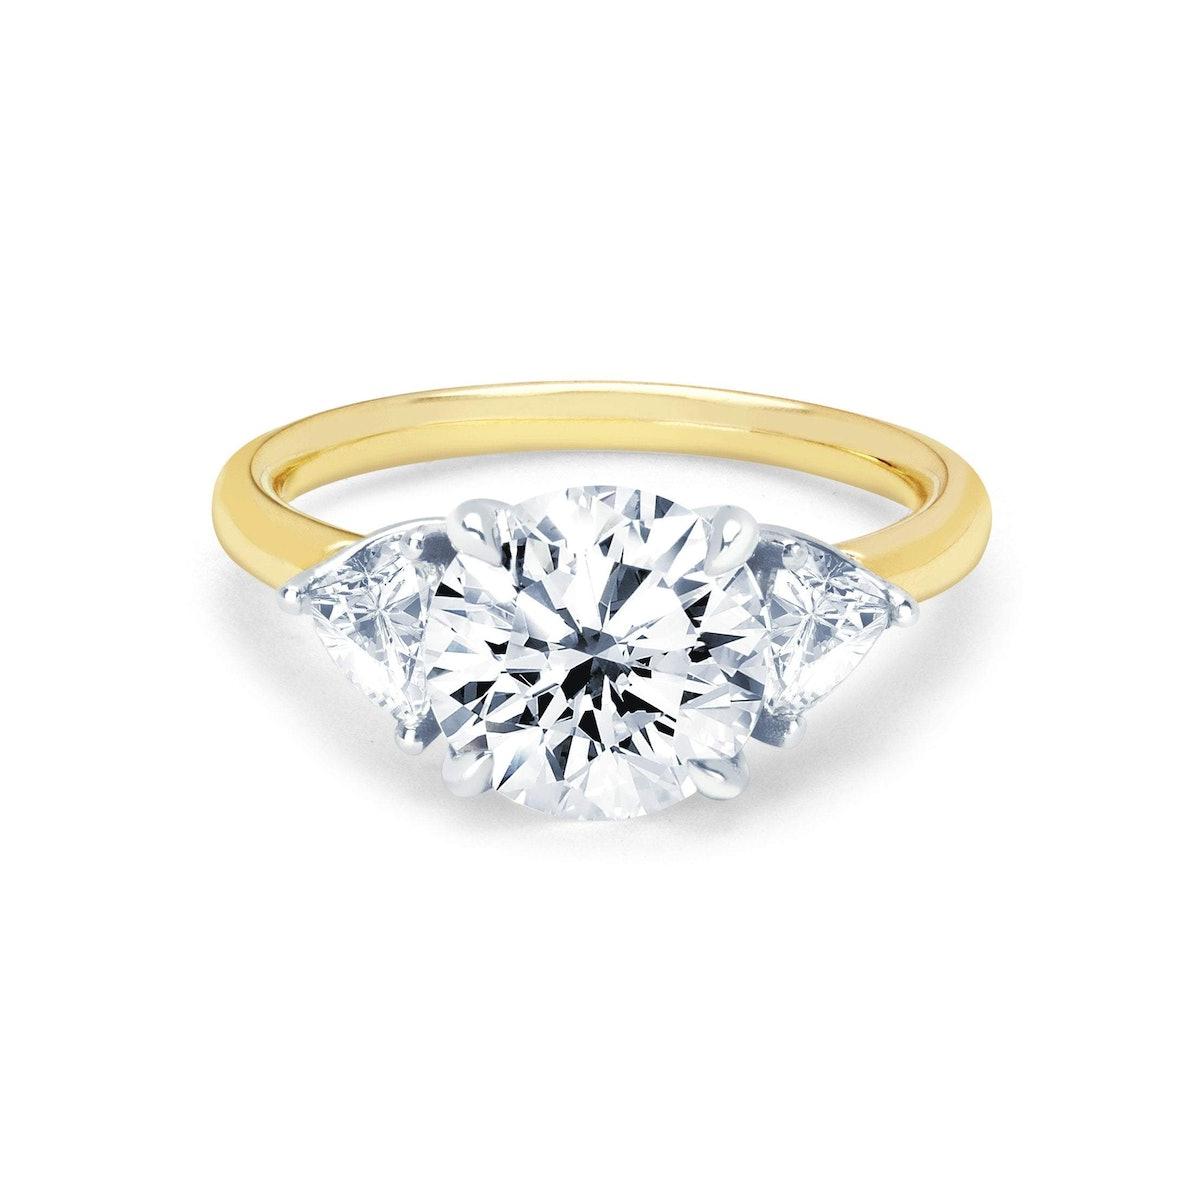 Round Diamond Setting with Side Trillion Diamonds from Logan Hollowell.